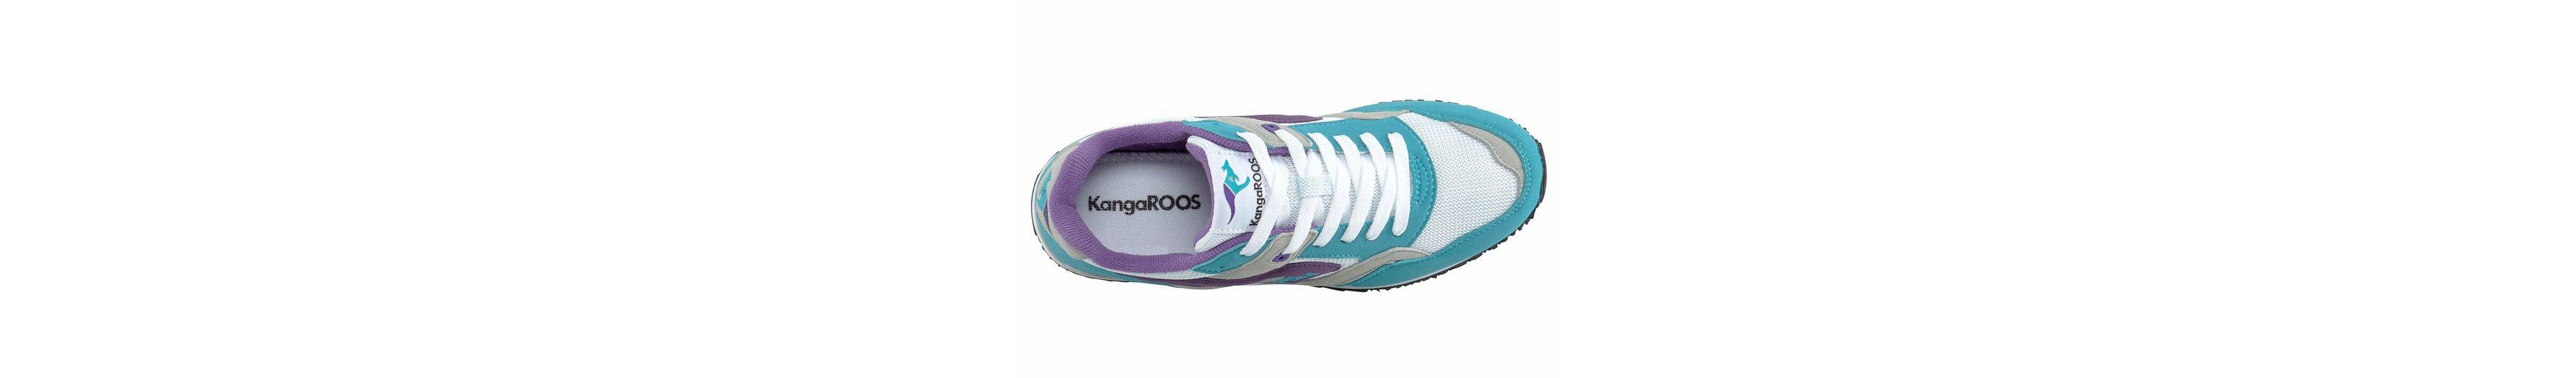 KangaROOS Racer 2 Sneaker Visa-Zahlung Günstig Online 2iosd3x1